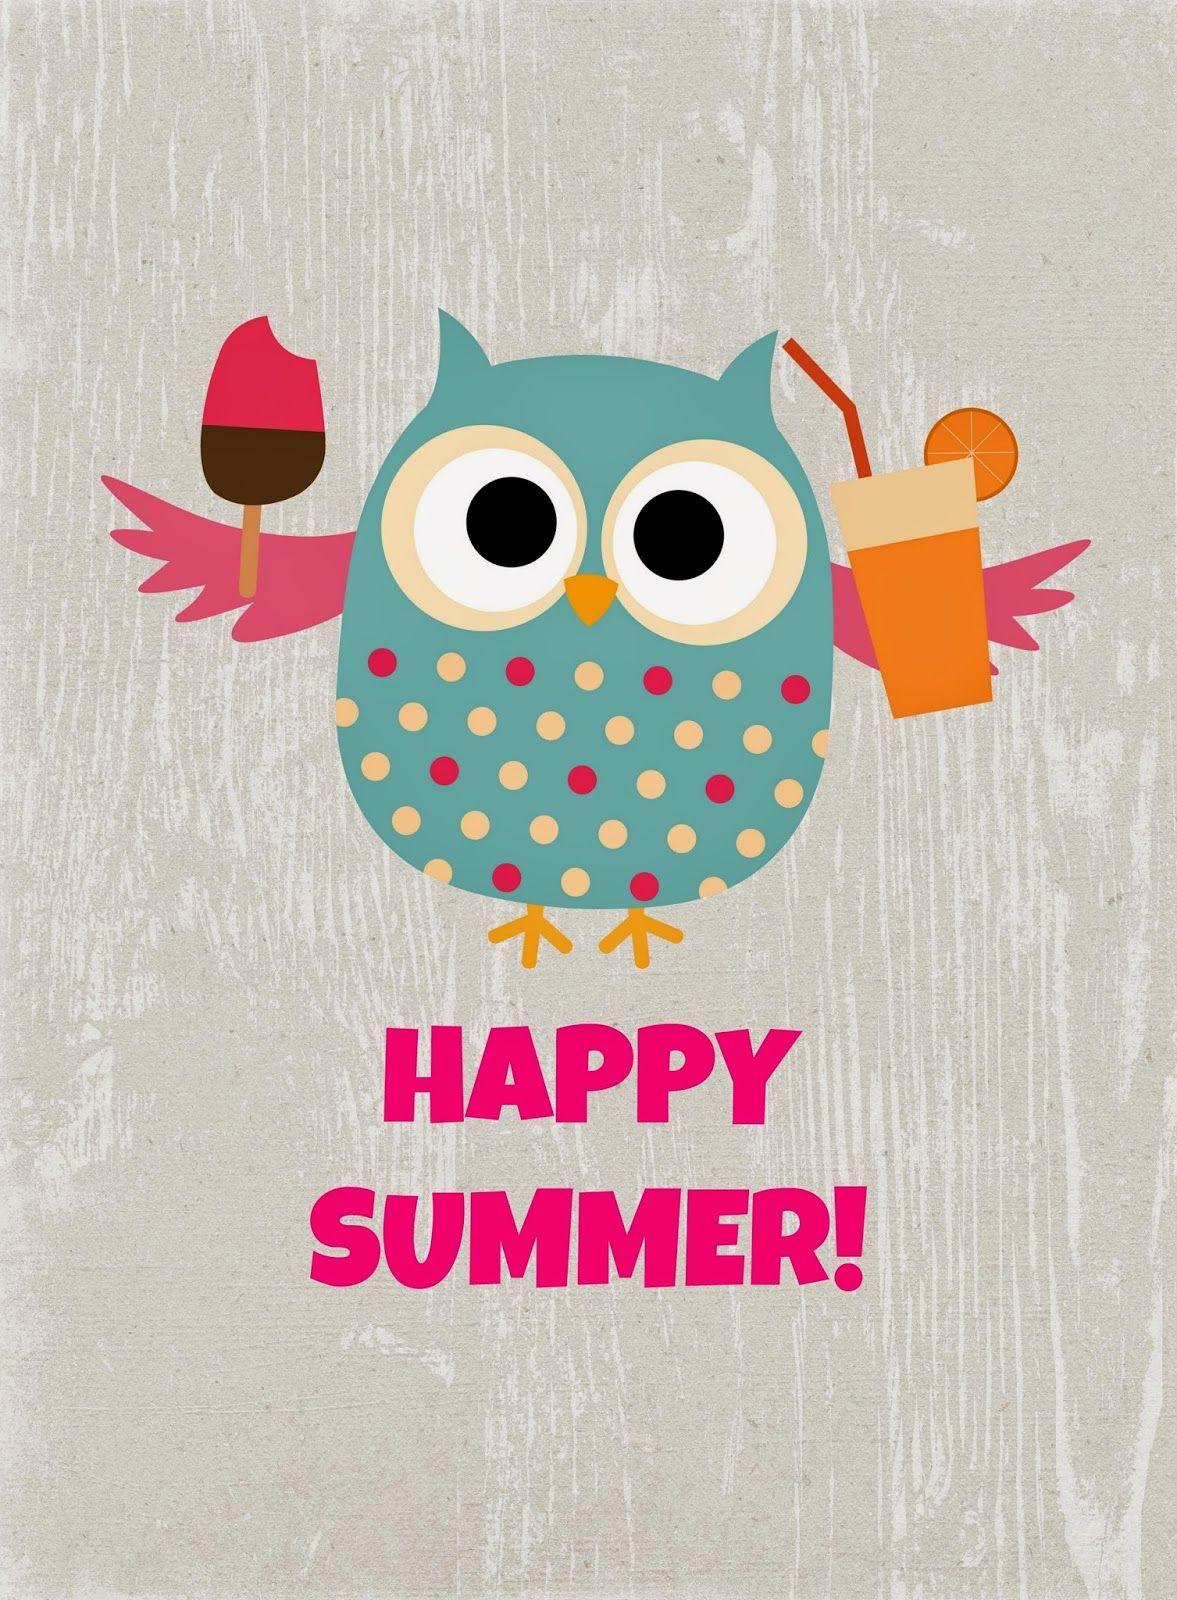 Free Summer Printables | Scrapbooking | Pinterest | Free Summer - Free Printable Summer Pictures